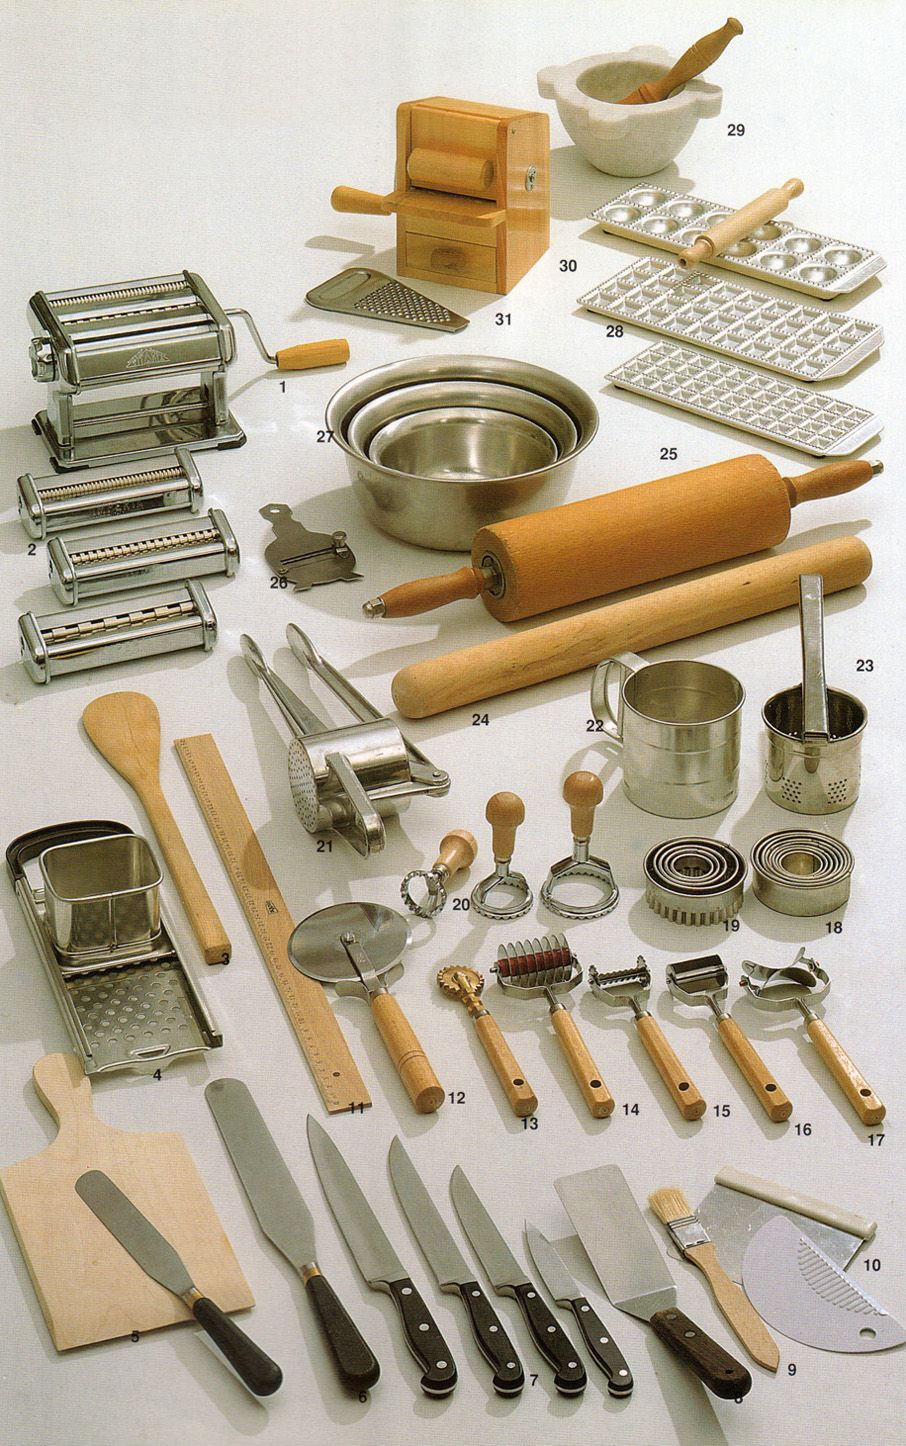 The Pasta Maker S Equipment Pasta Maker Cooking Equipment